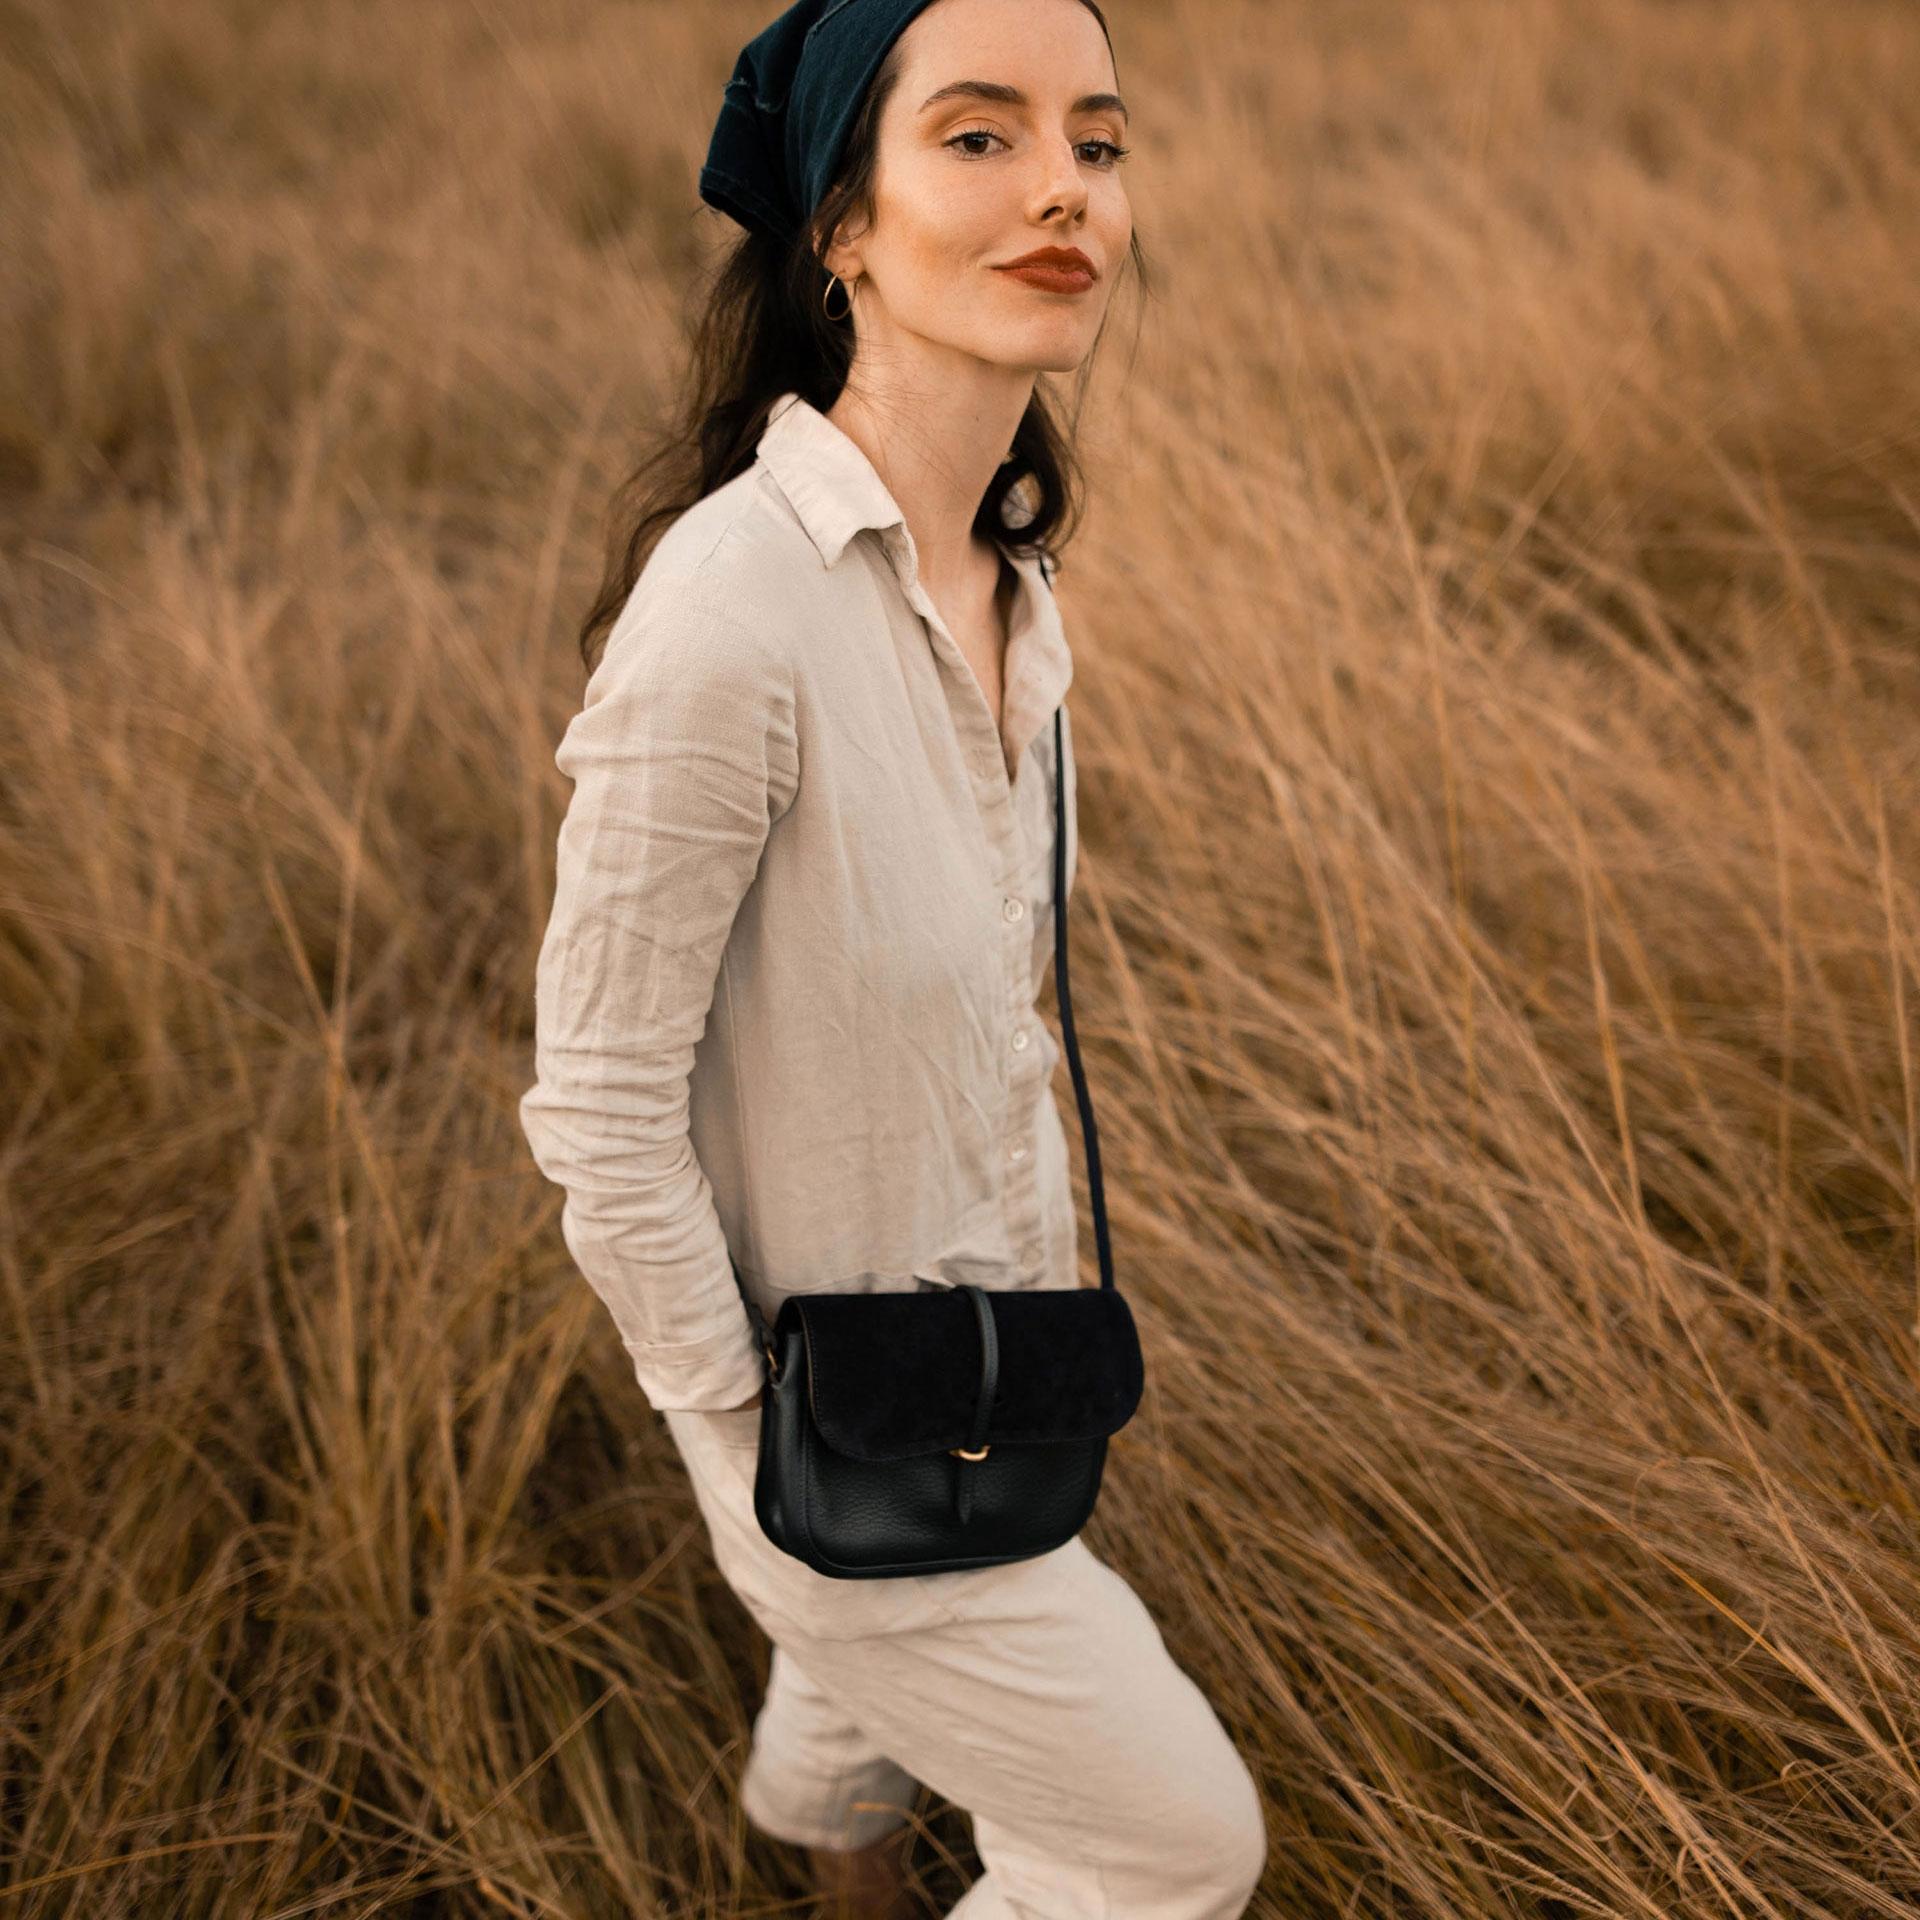 Pastis handbag - Khaki / Mix (image n°5)